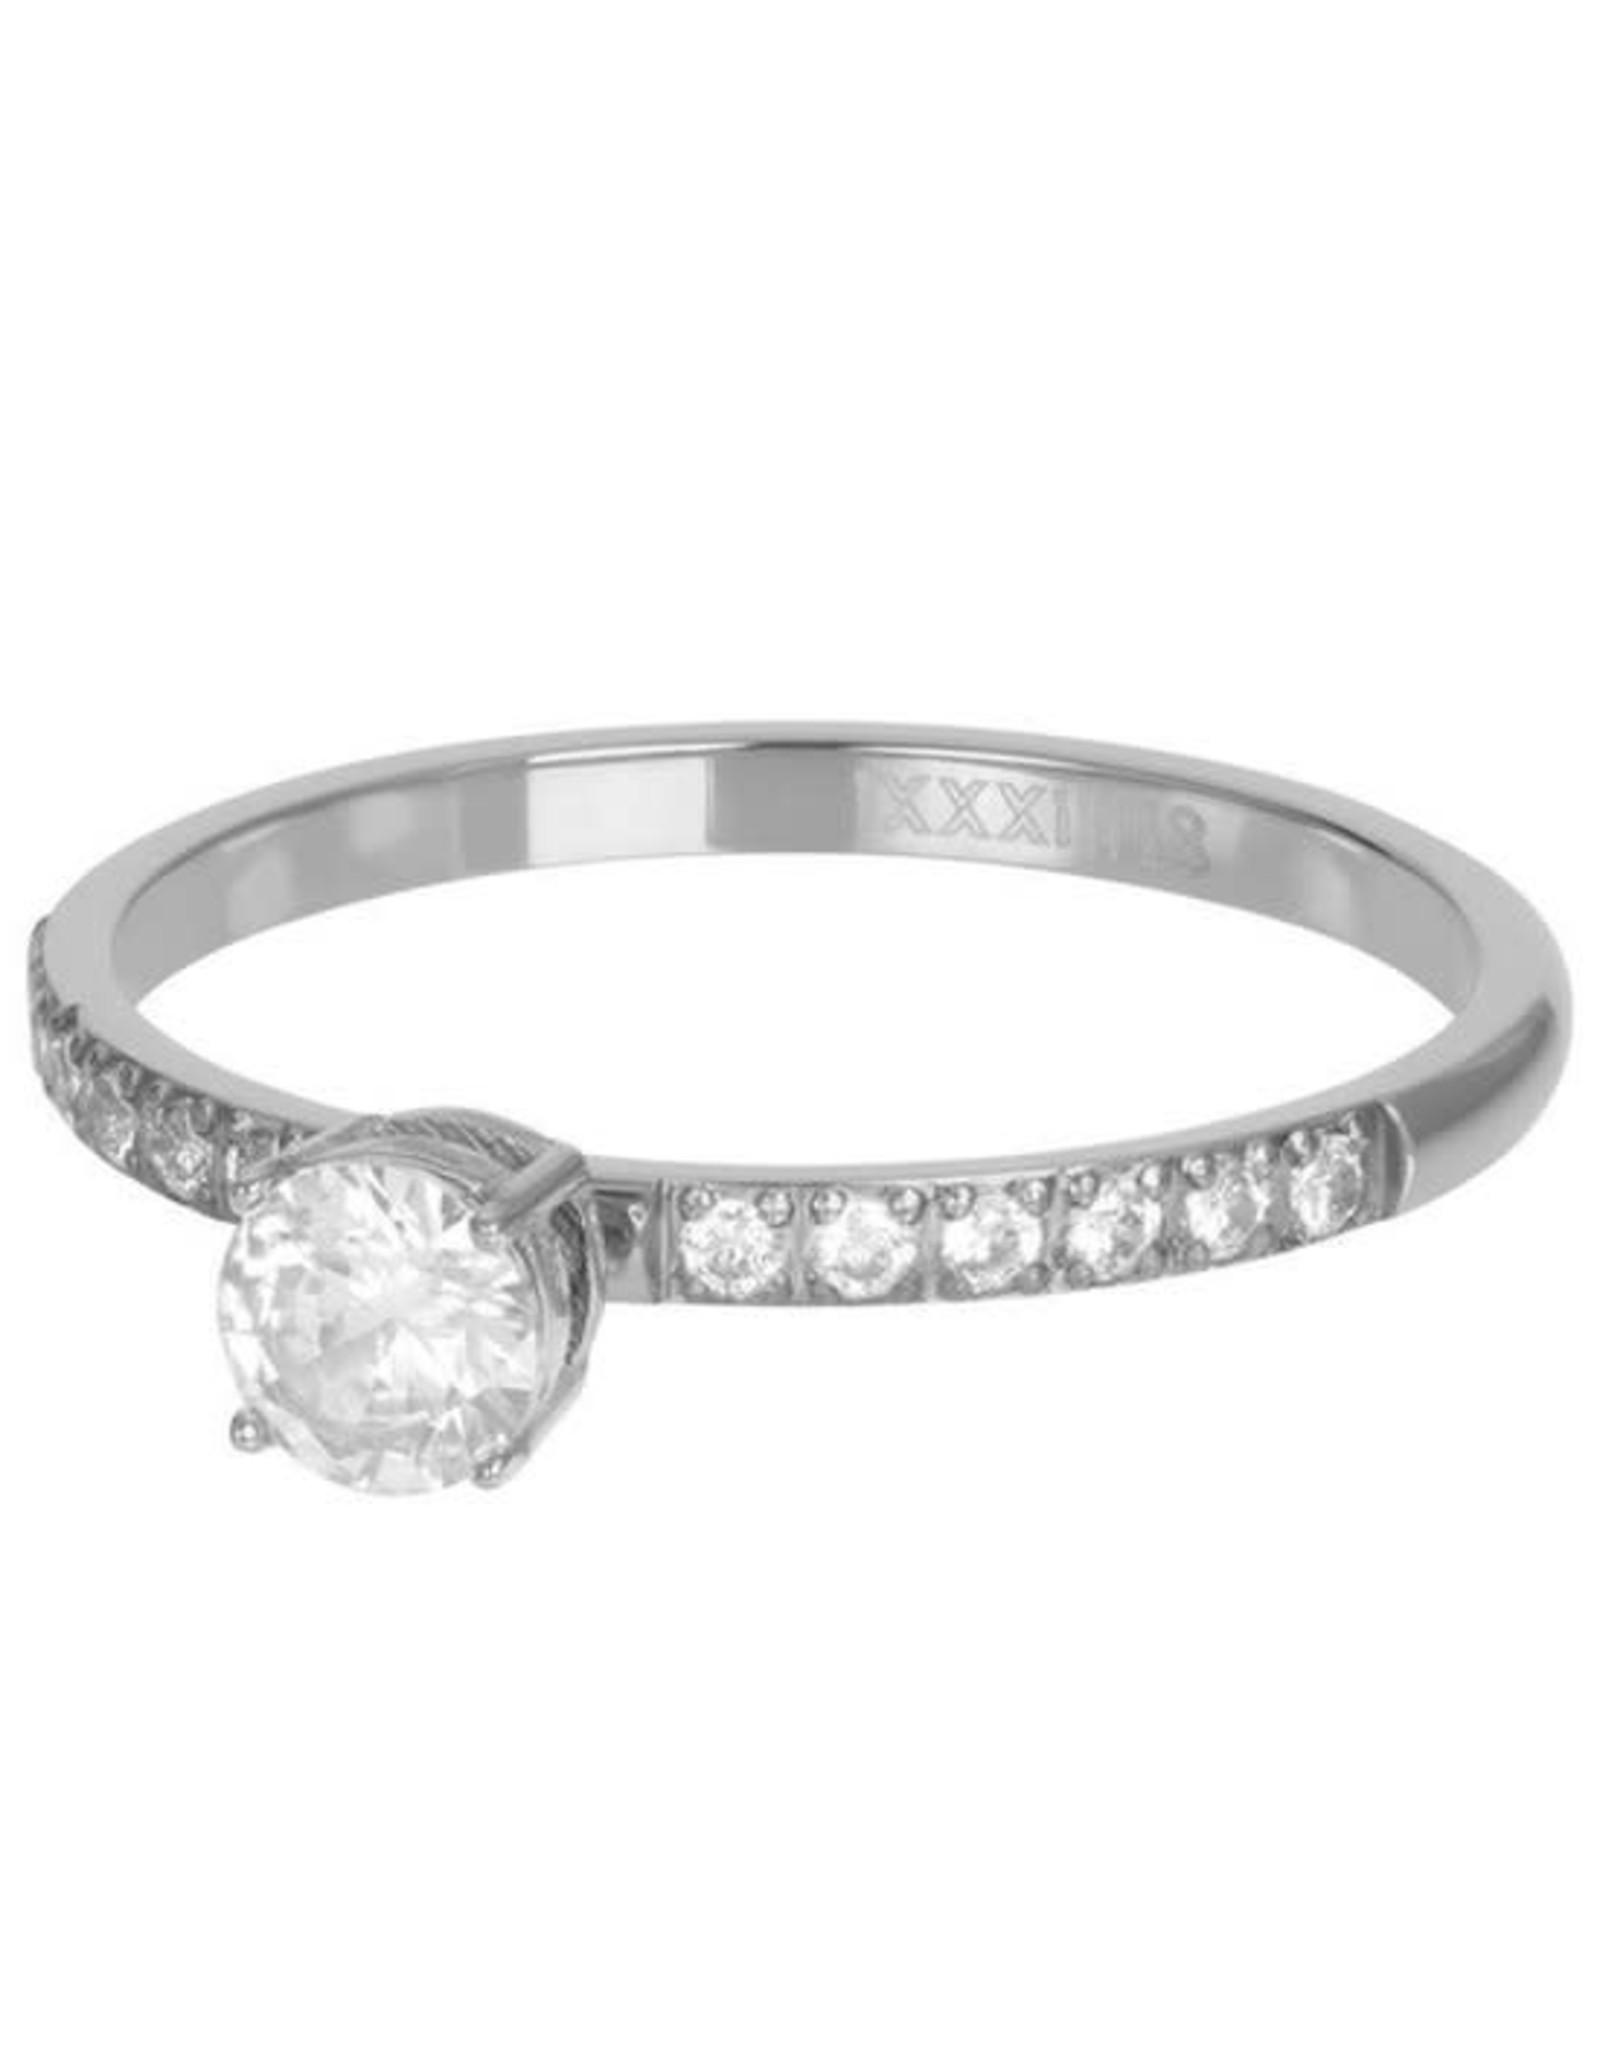 IXXXI IXXXI Queen ring Silver